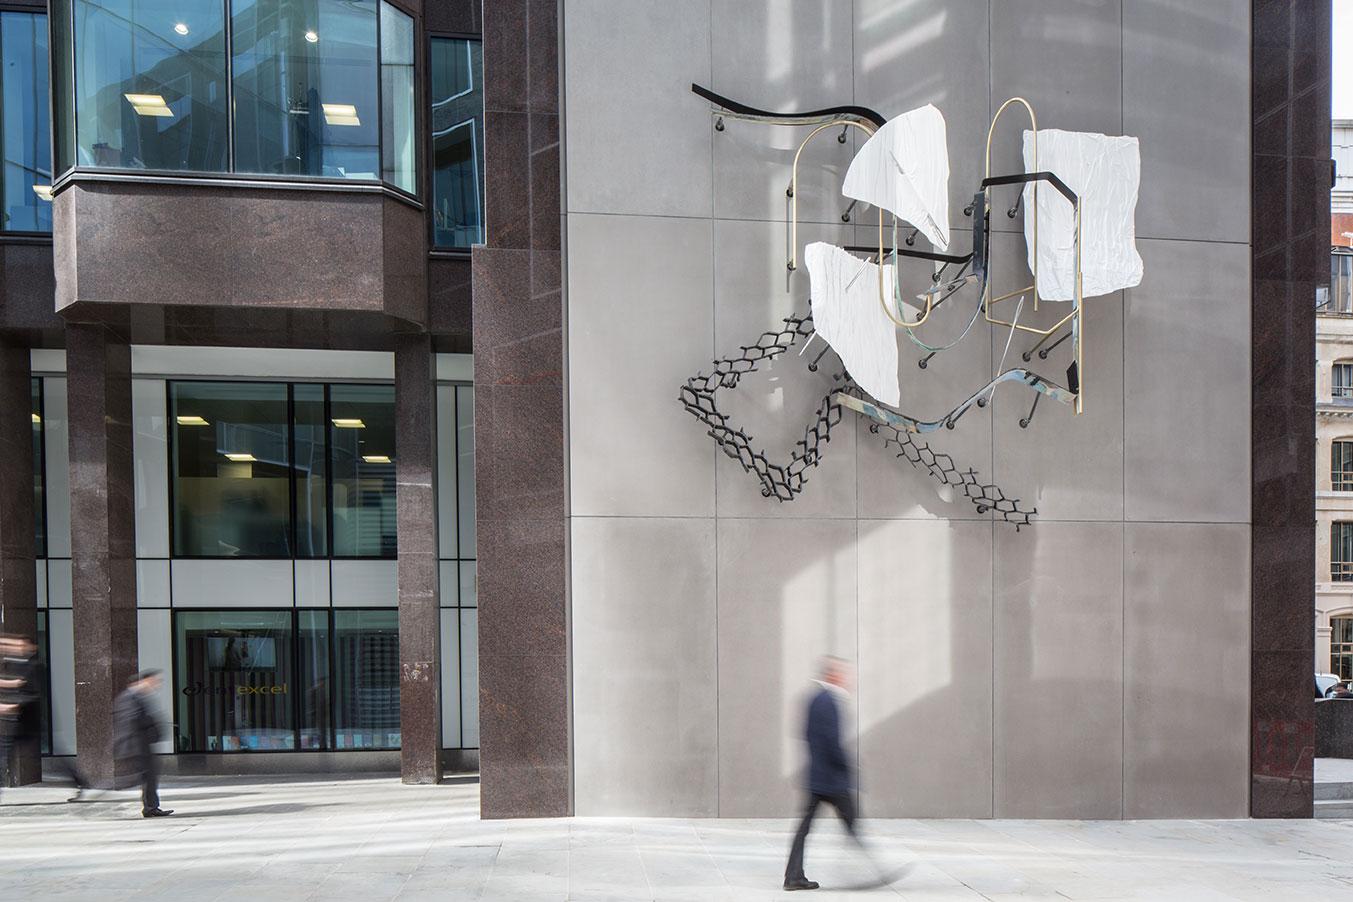 Angel Court Sculpture, London